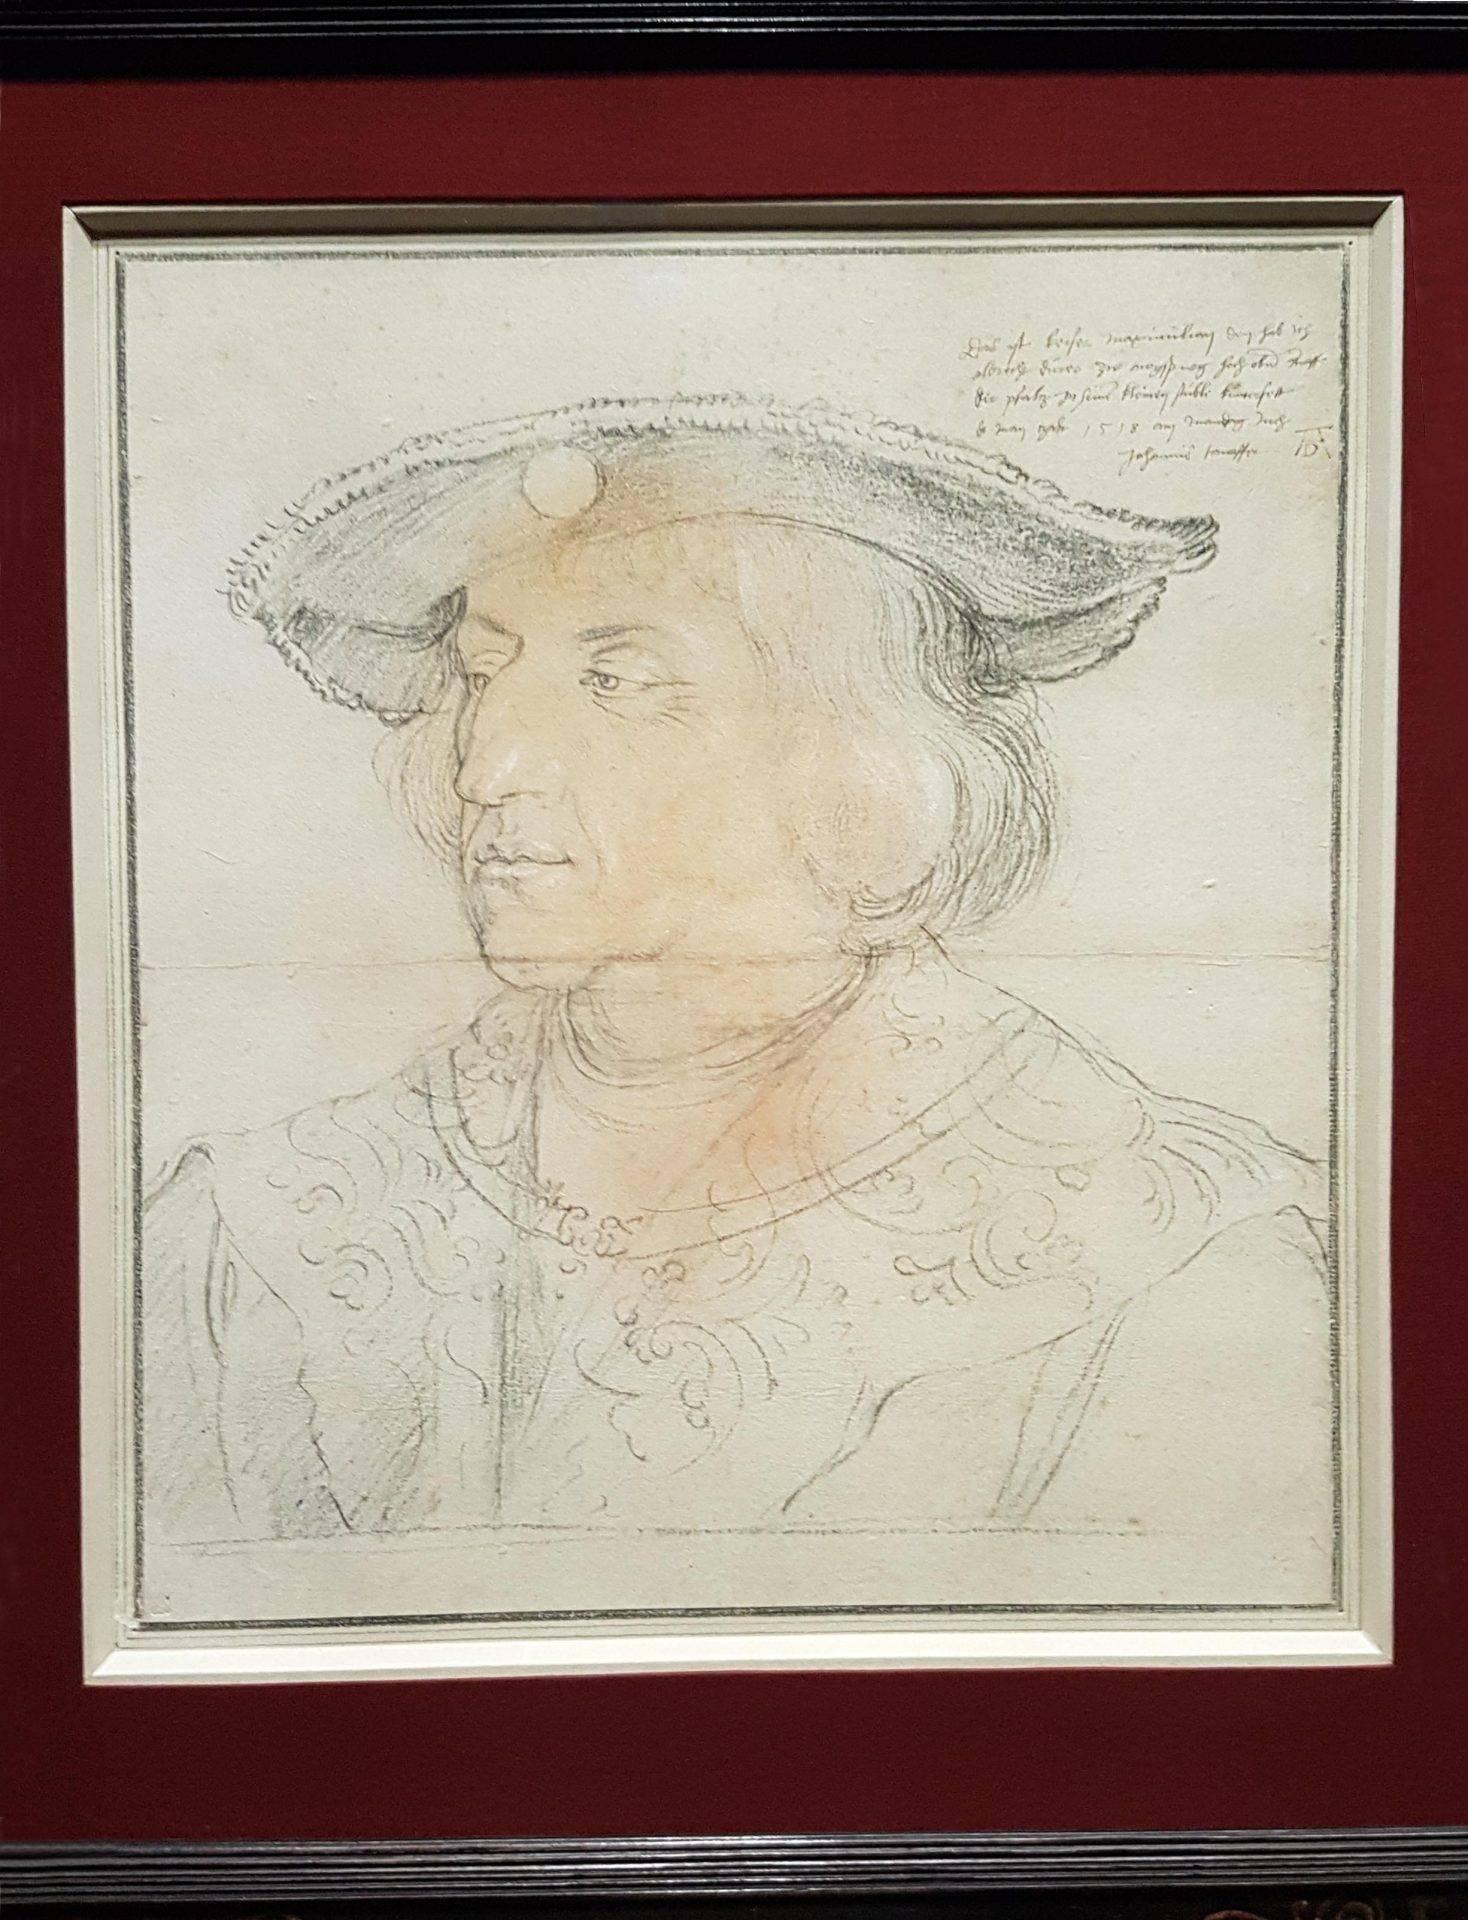 Portrait of Maximilian I (1518) at the Albertina exhibition. Photo Art with me! e.U., 2019